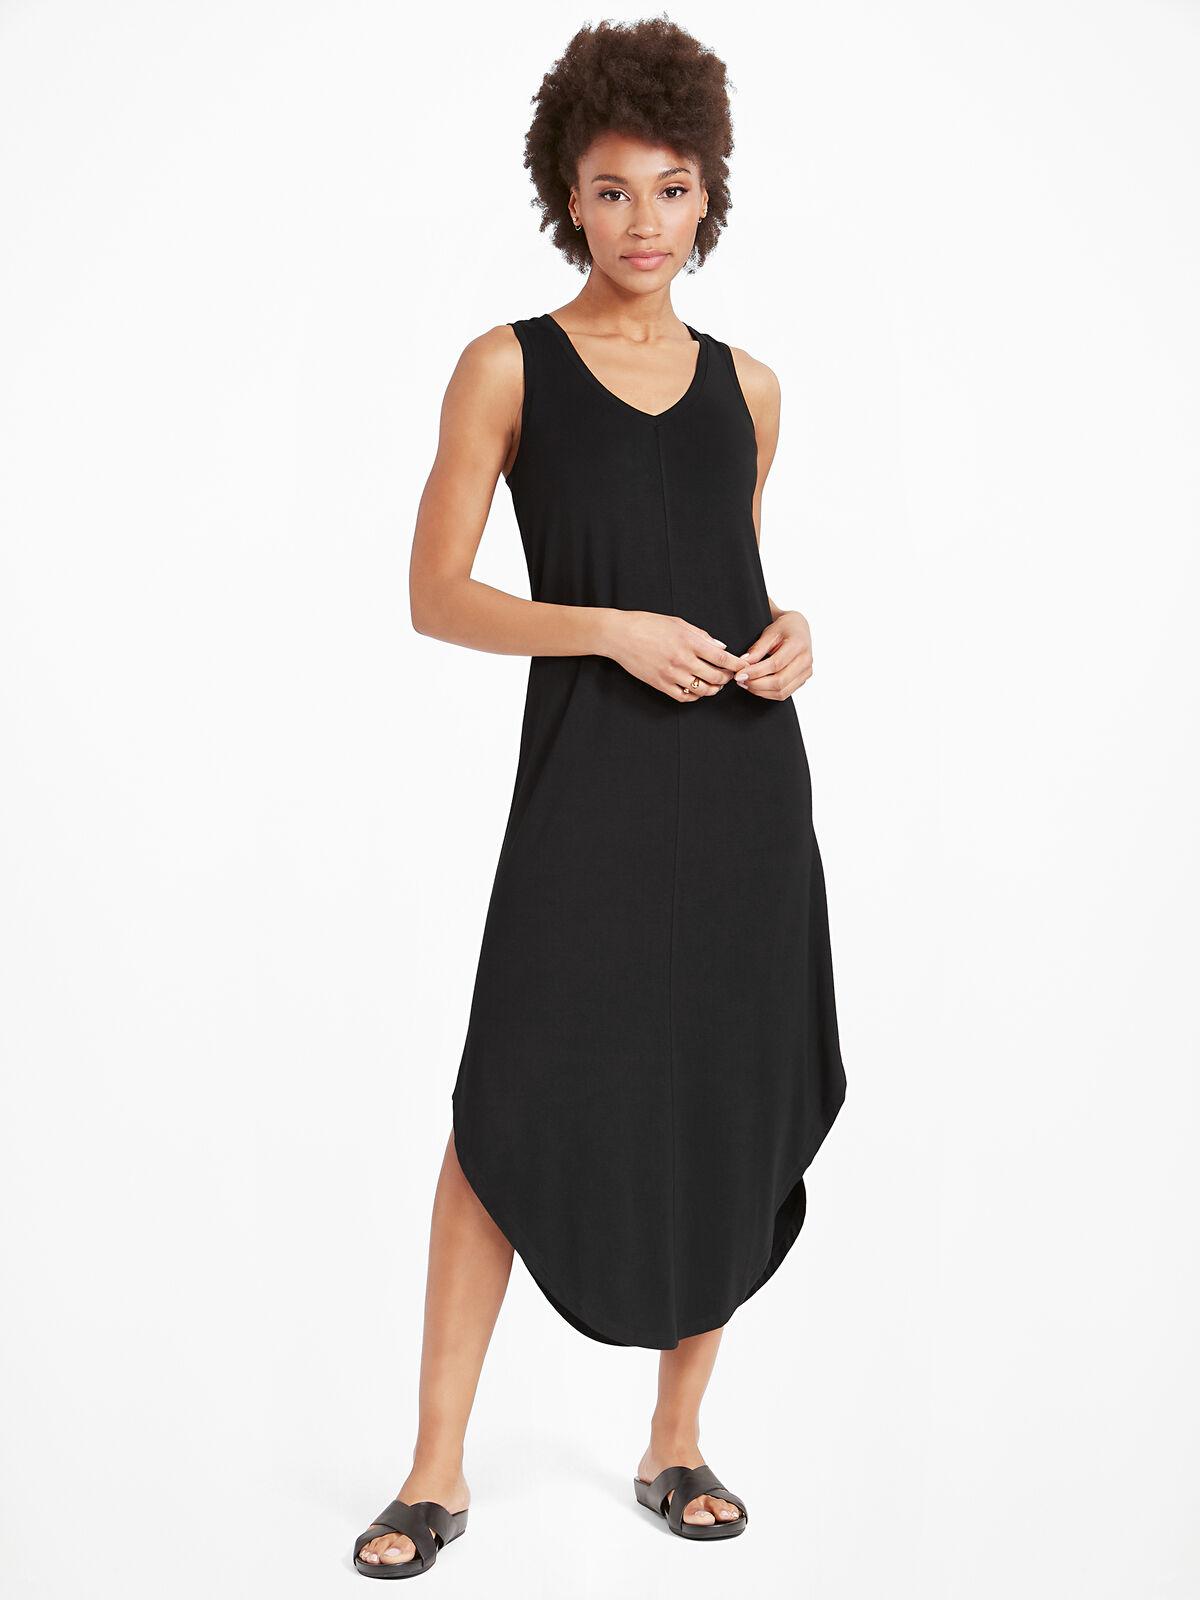 Eaze Dress